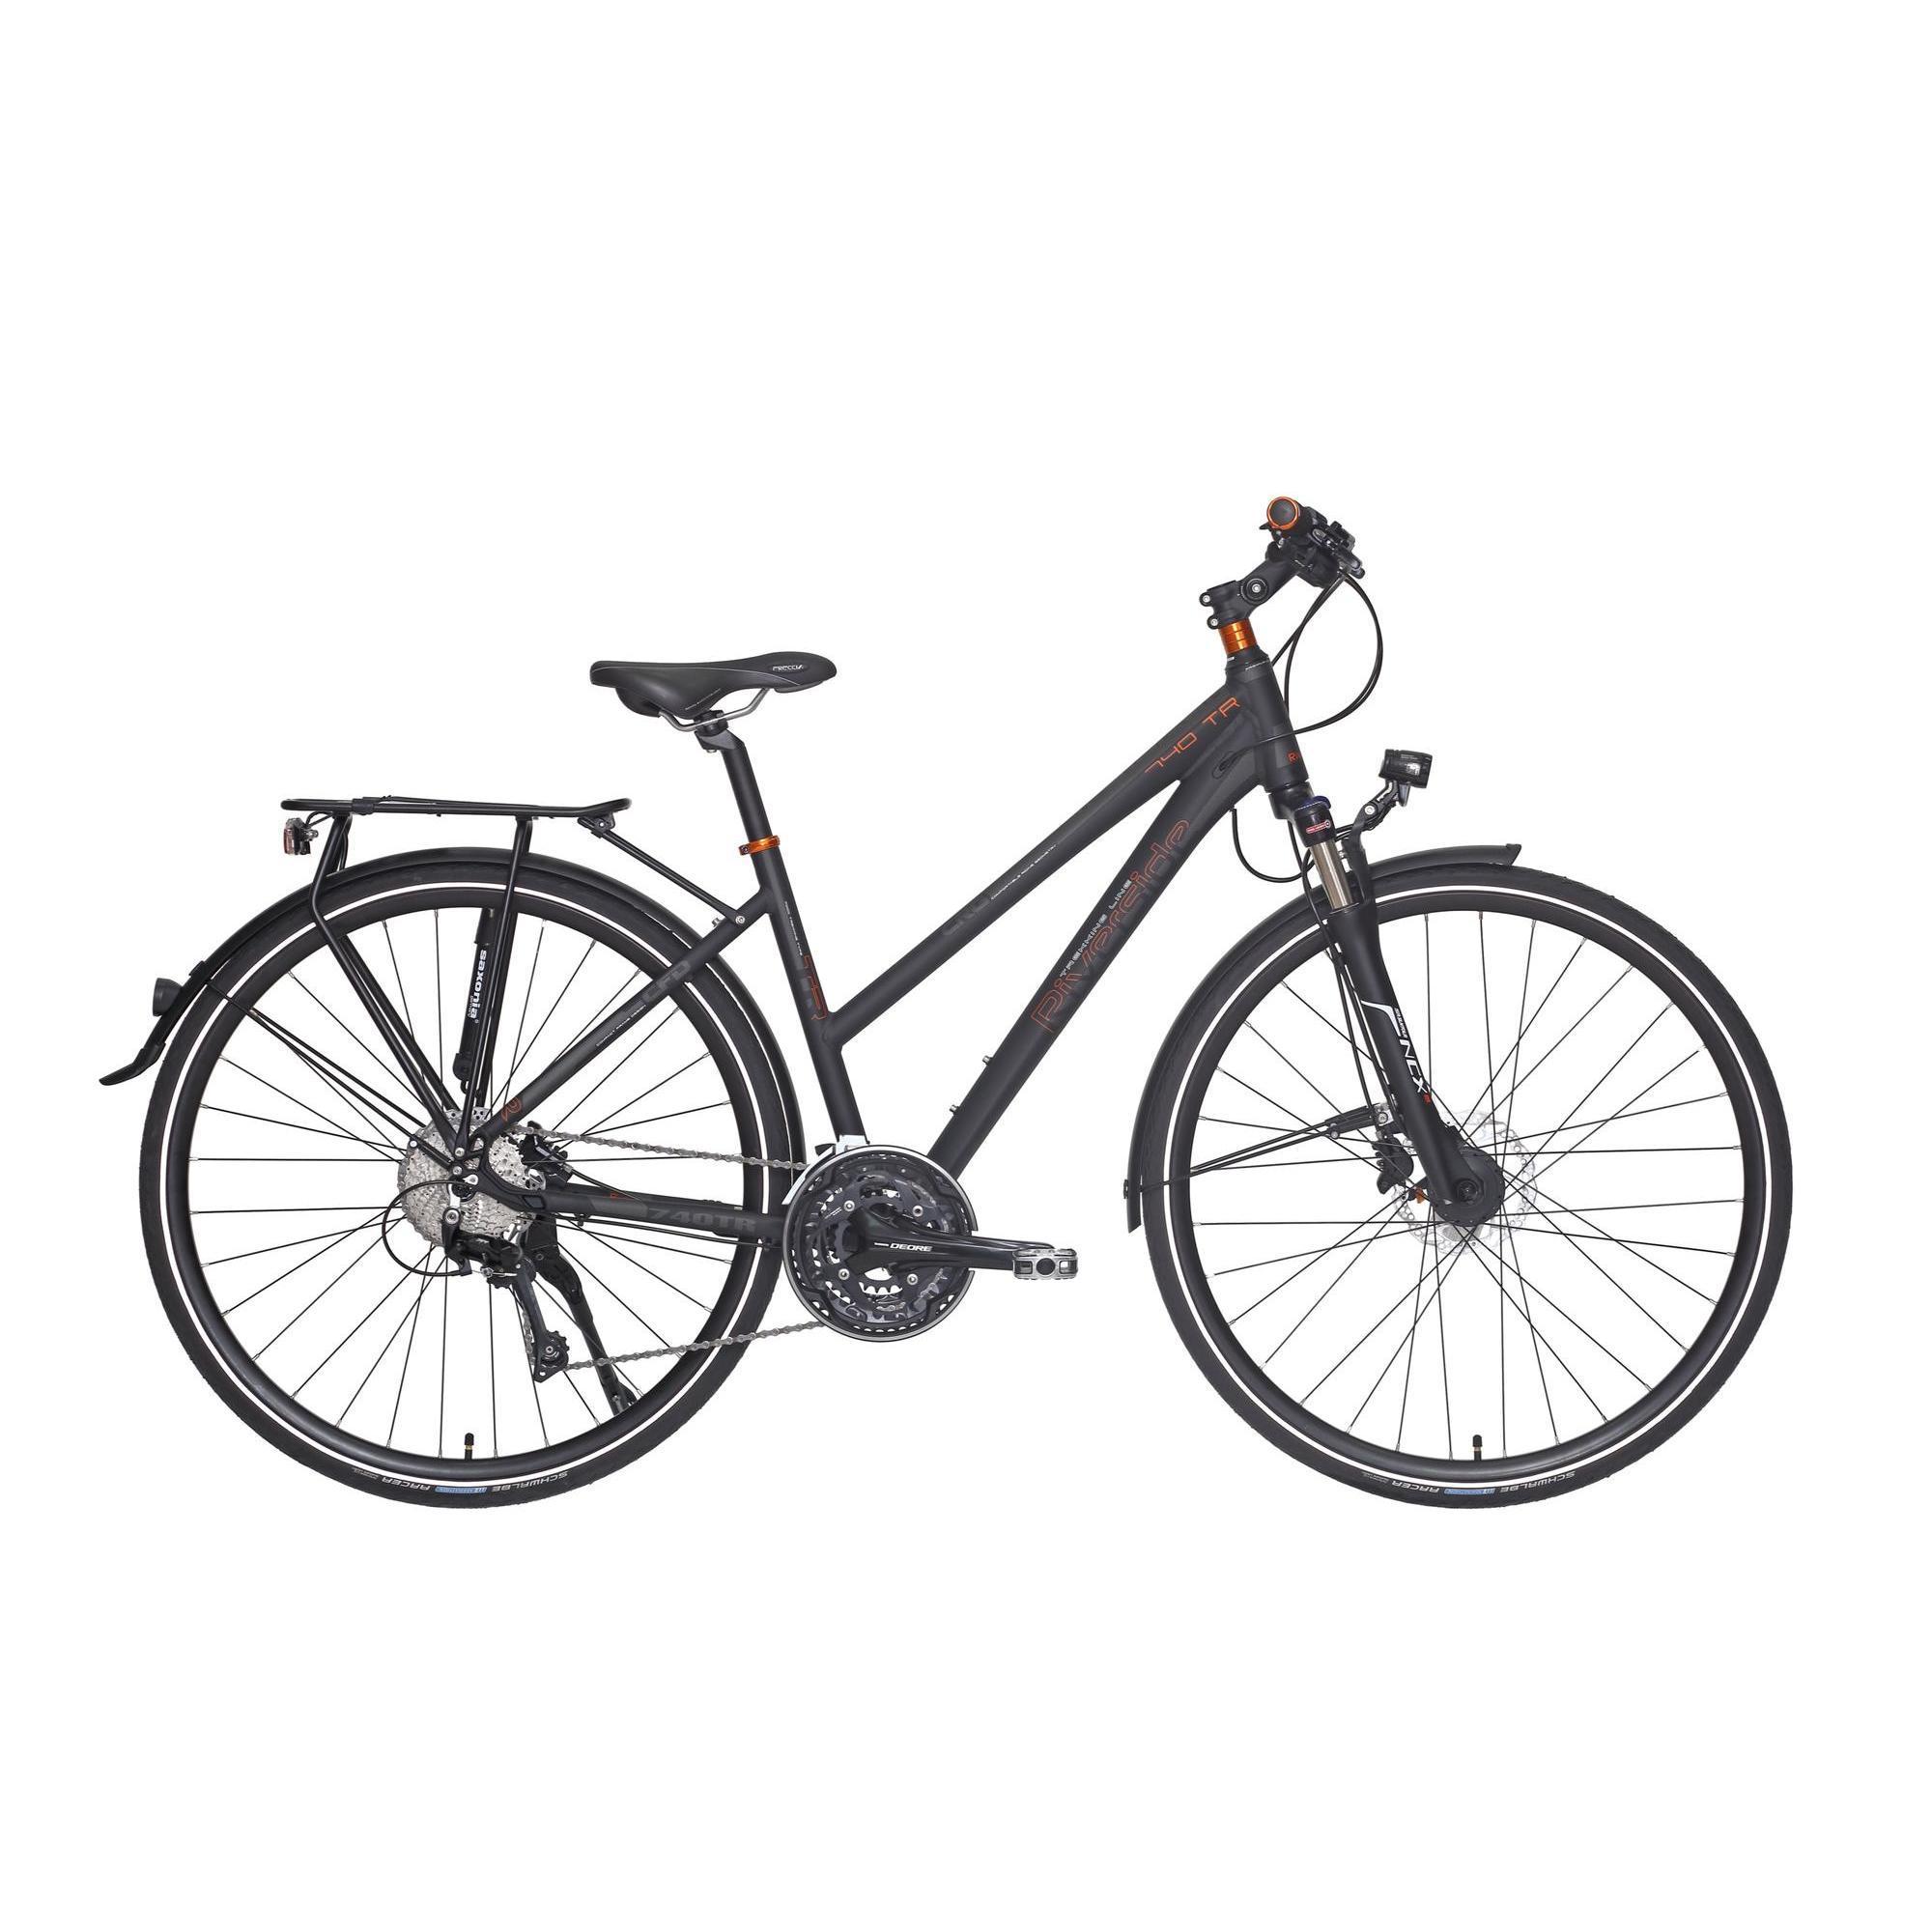 fahrrad 28 trekkingrad riverside 740 tr damen anthrazit orange riverside decathlon. Black Bedroom Furniture Sets. Home Design Ideas